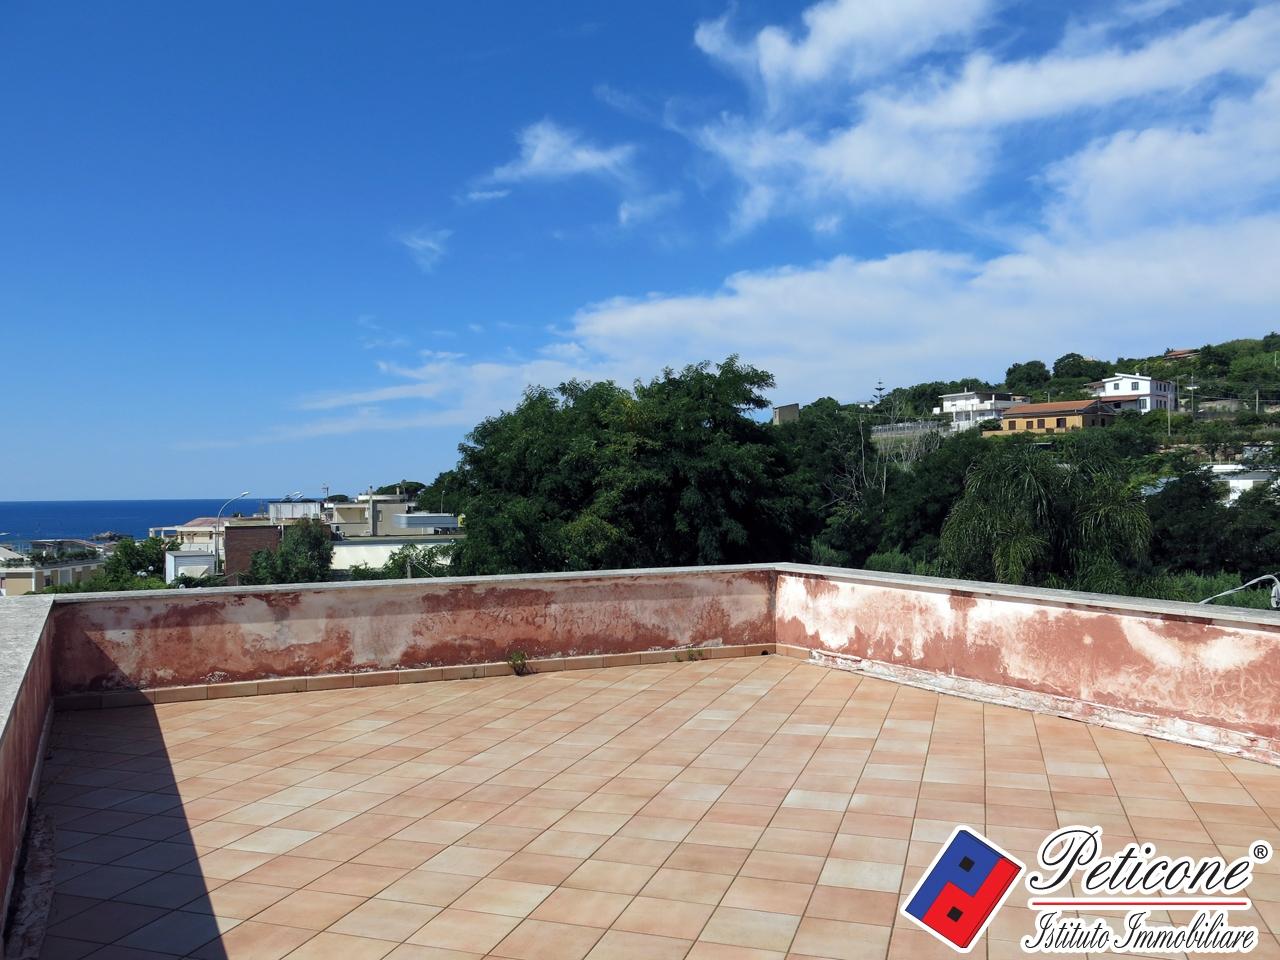 Villa in Vendita a Gaeta: 5 locali, 250 mq - Foto 16